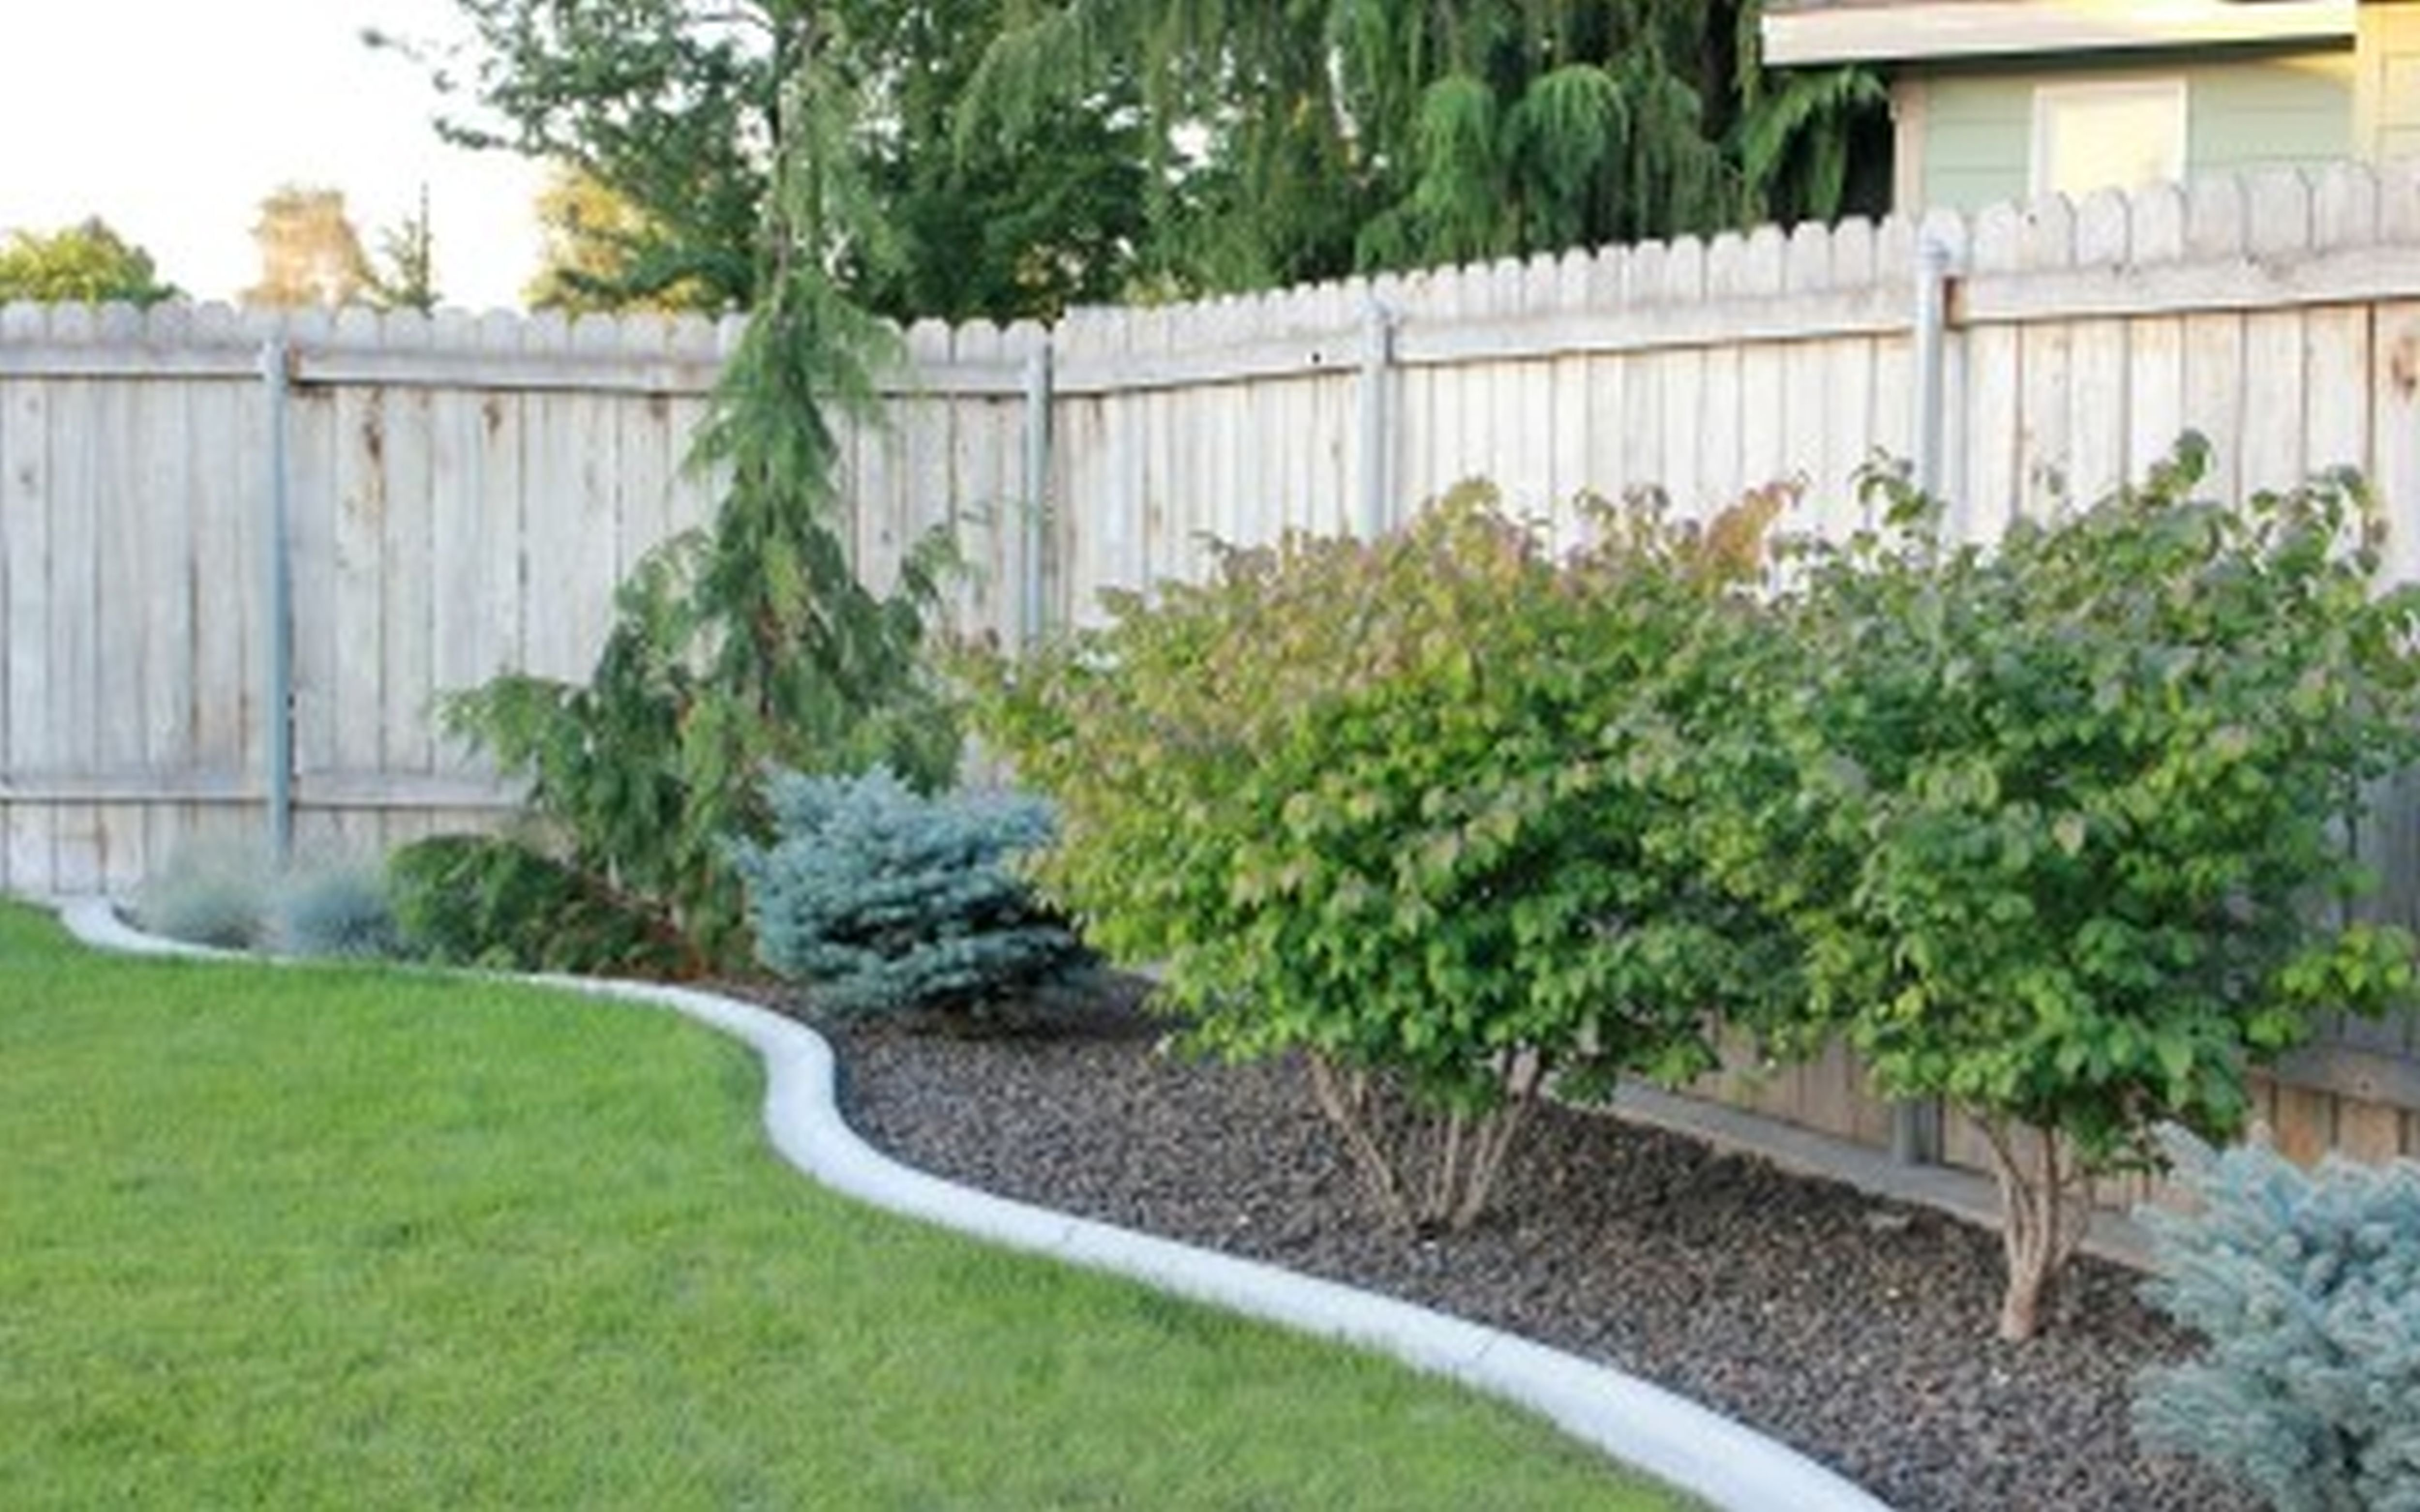 10 Famous Landscape Ideas On A Budget backyard landscape ideas on a budget large and beautiful photos 4 2021